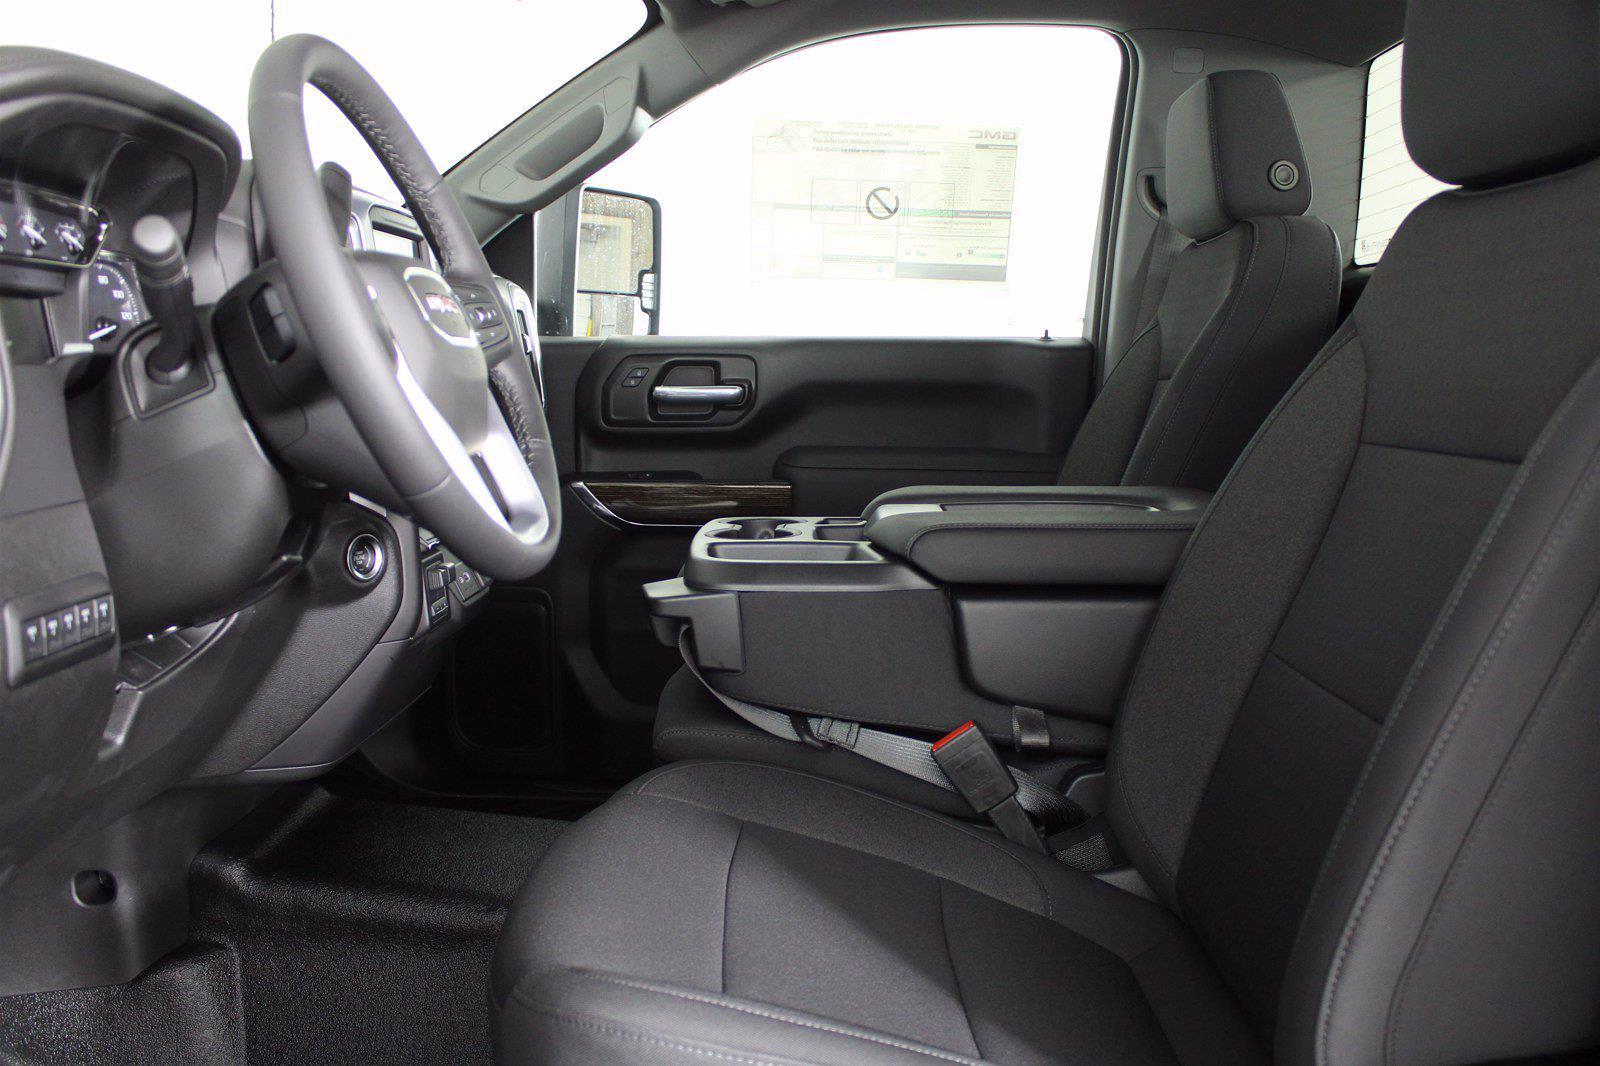 2022 Sierra 2500 Regular Cab 4x4,  Pickup #D420036 - photo 15